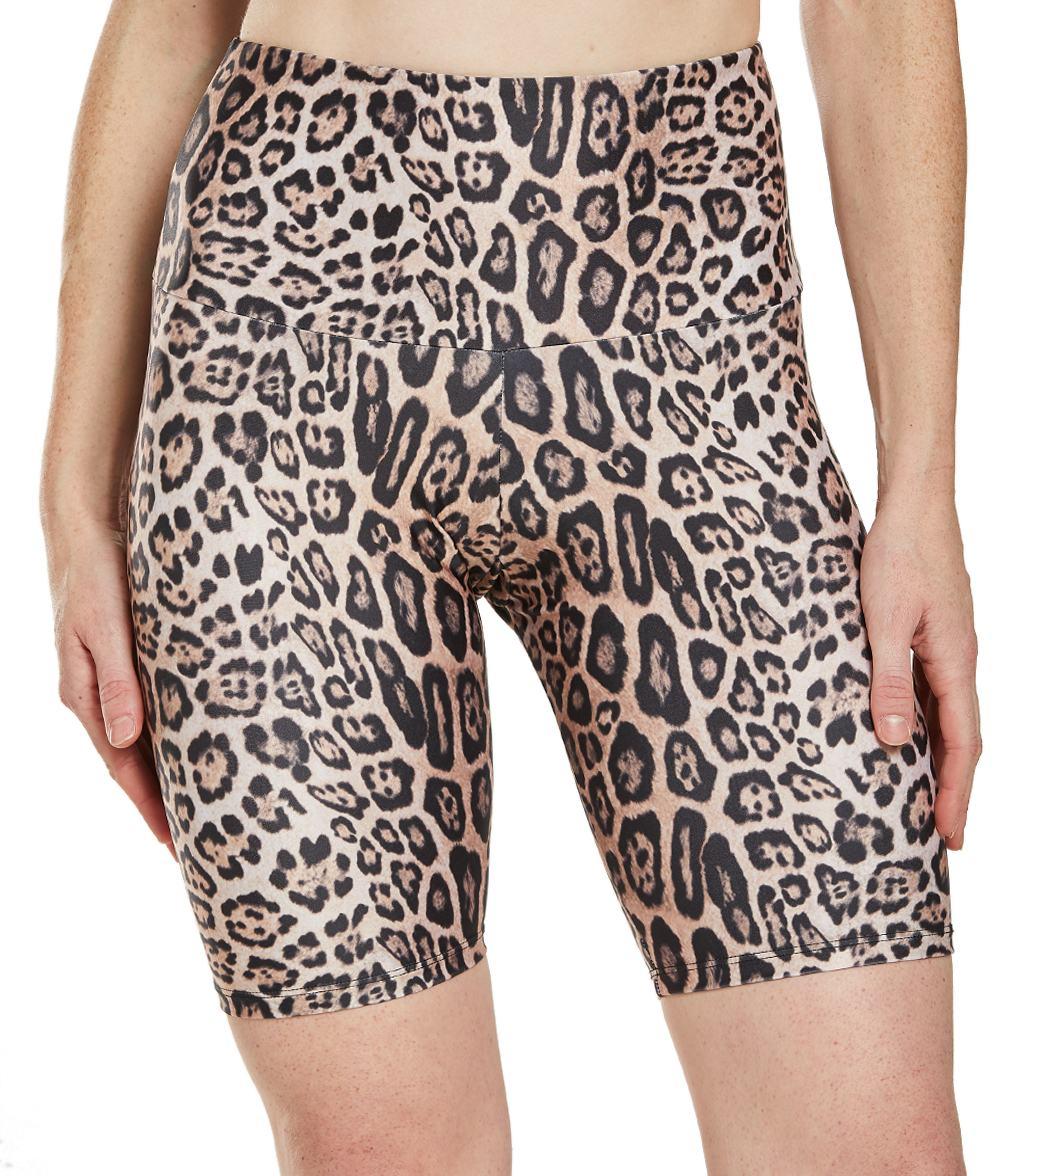 Onzie Women's High Rise Bike Shorts - Leopard - Medium/Large Spandex